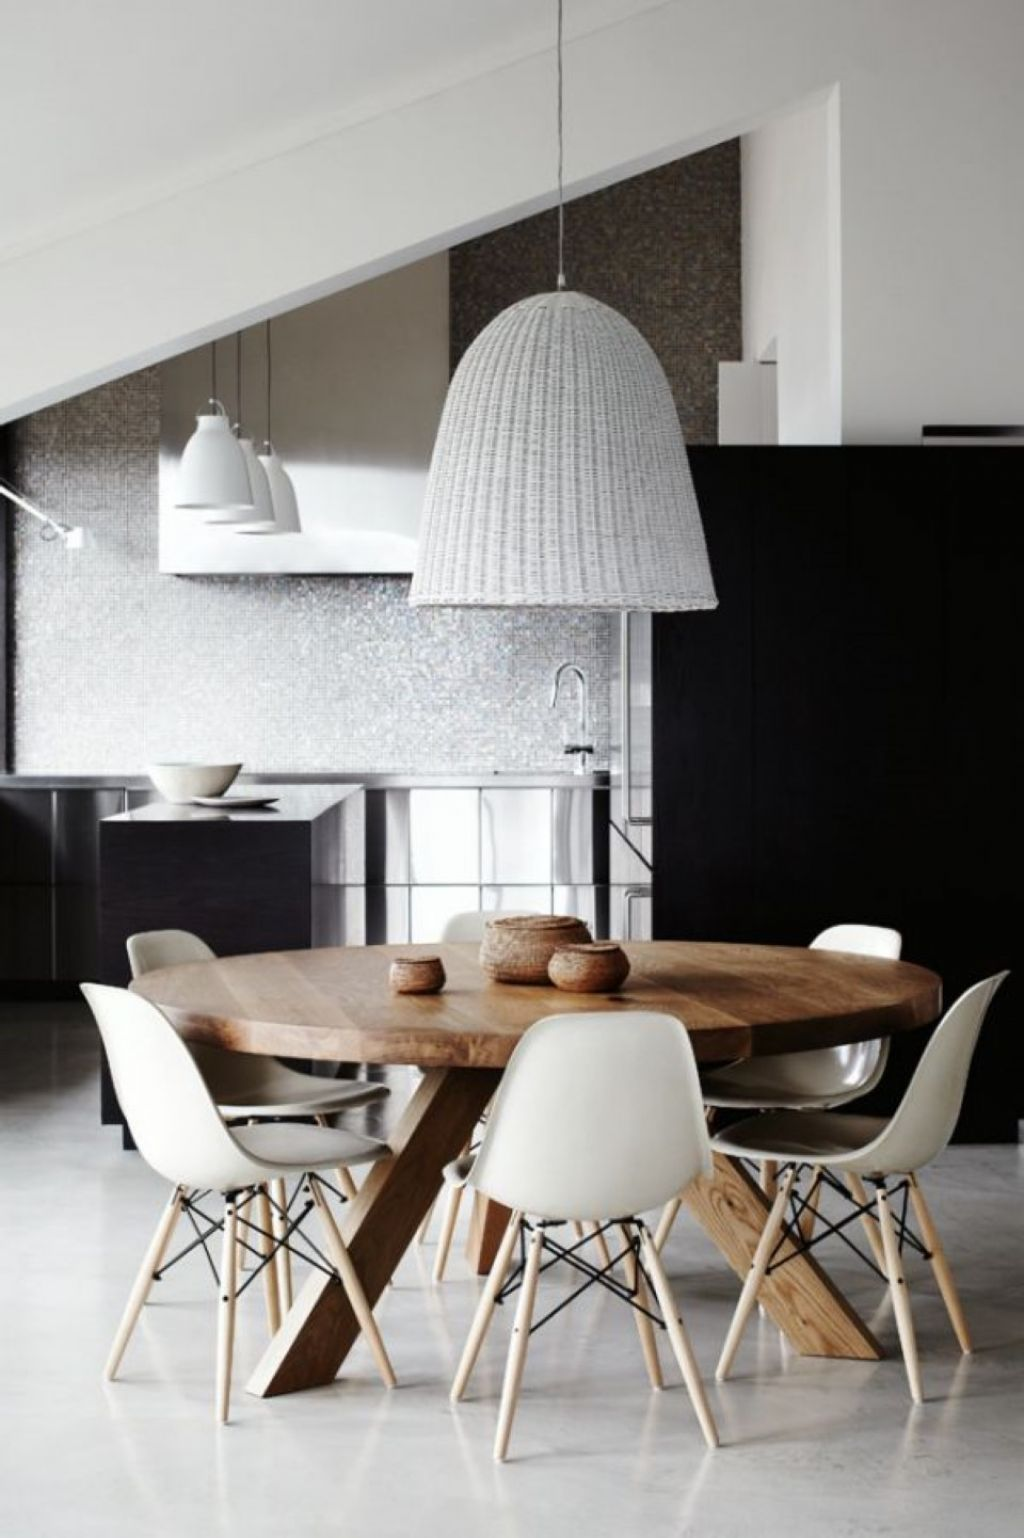 Large Scandinavian Lighting Pendant Google Search Dining Room